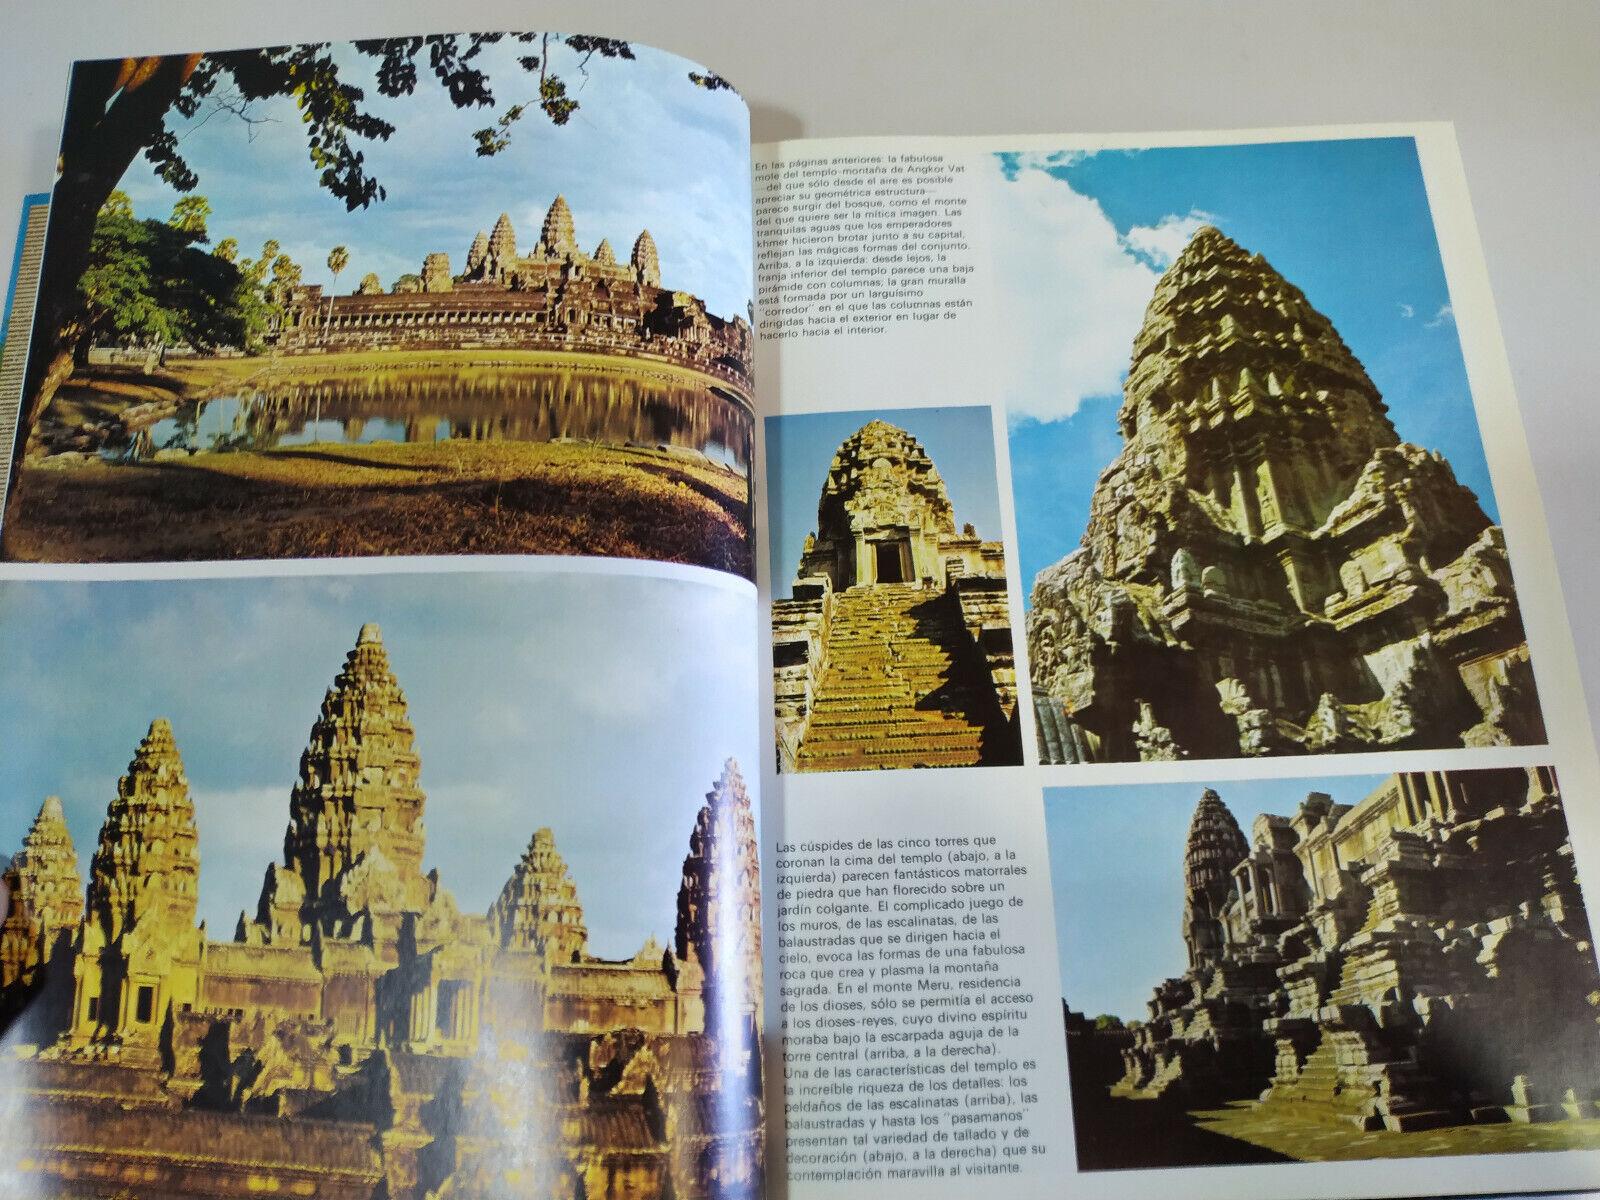 s l1600 - Maravillas del Mundo Angkor Vat Azay le Rideau Libro Tapa Dura Español